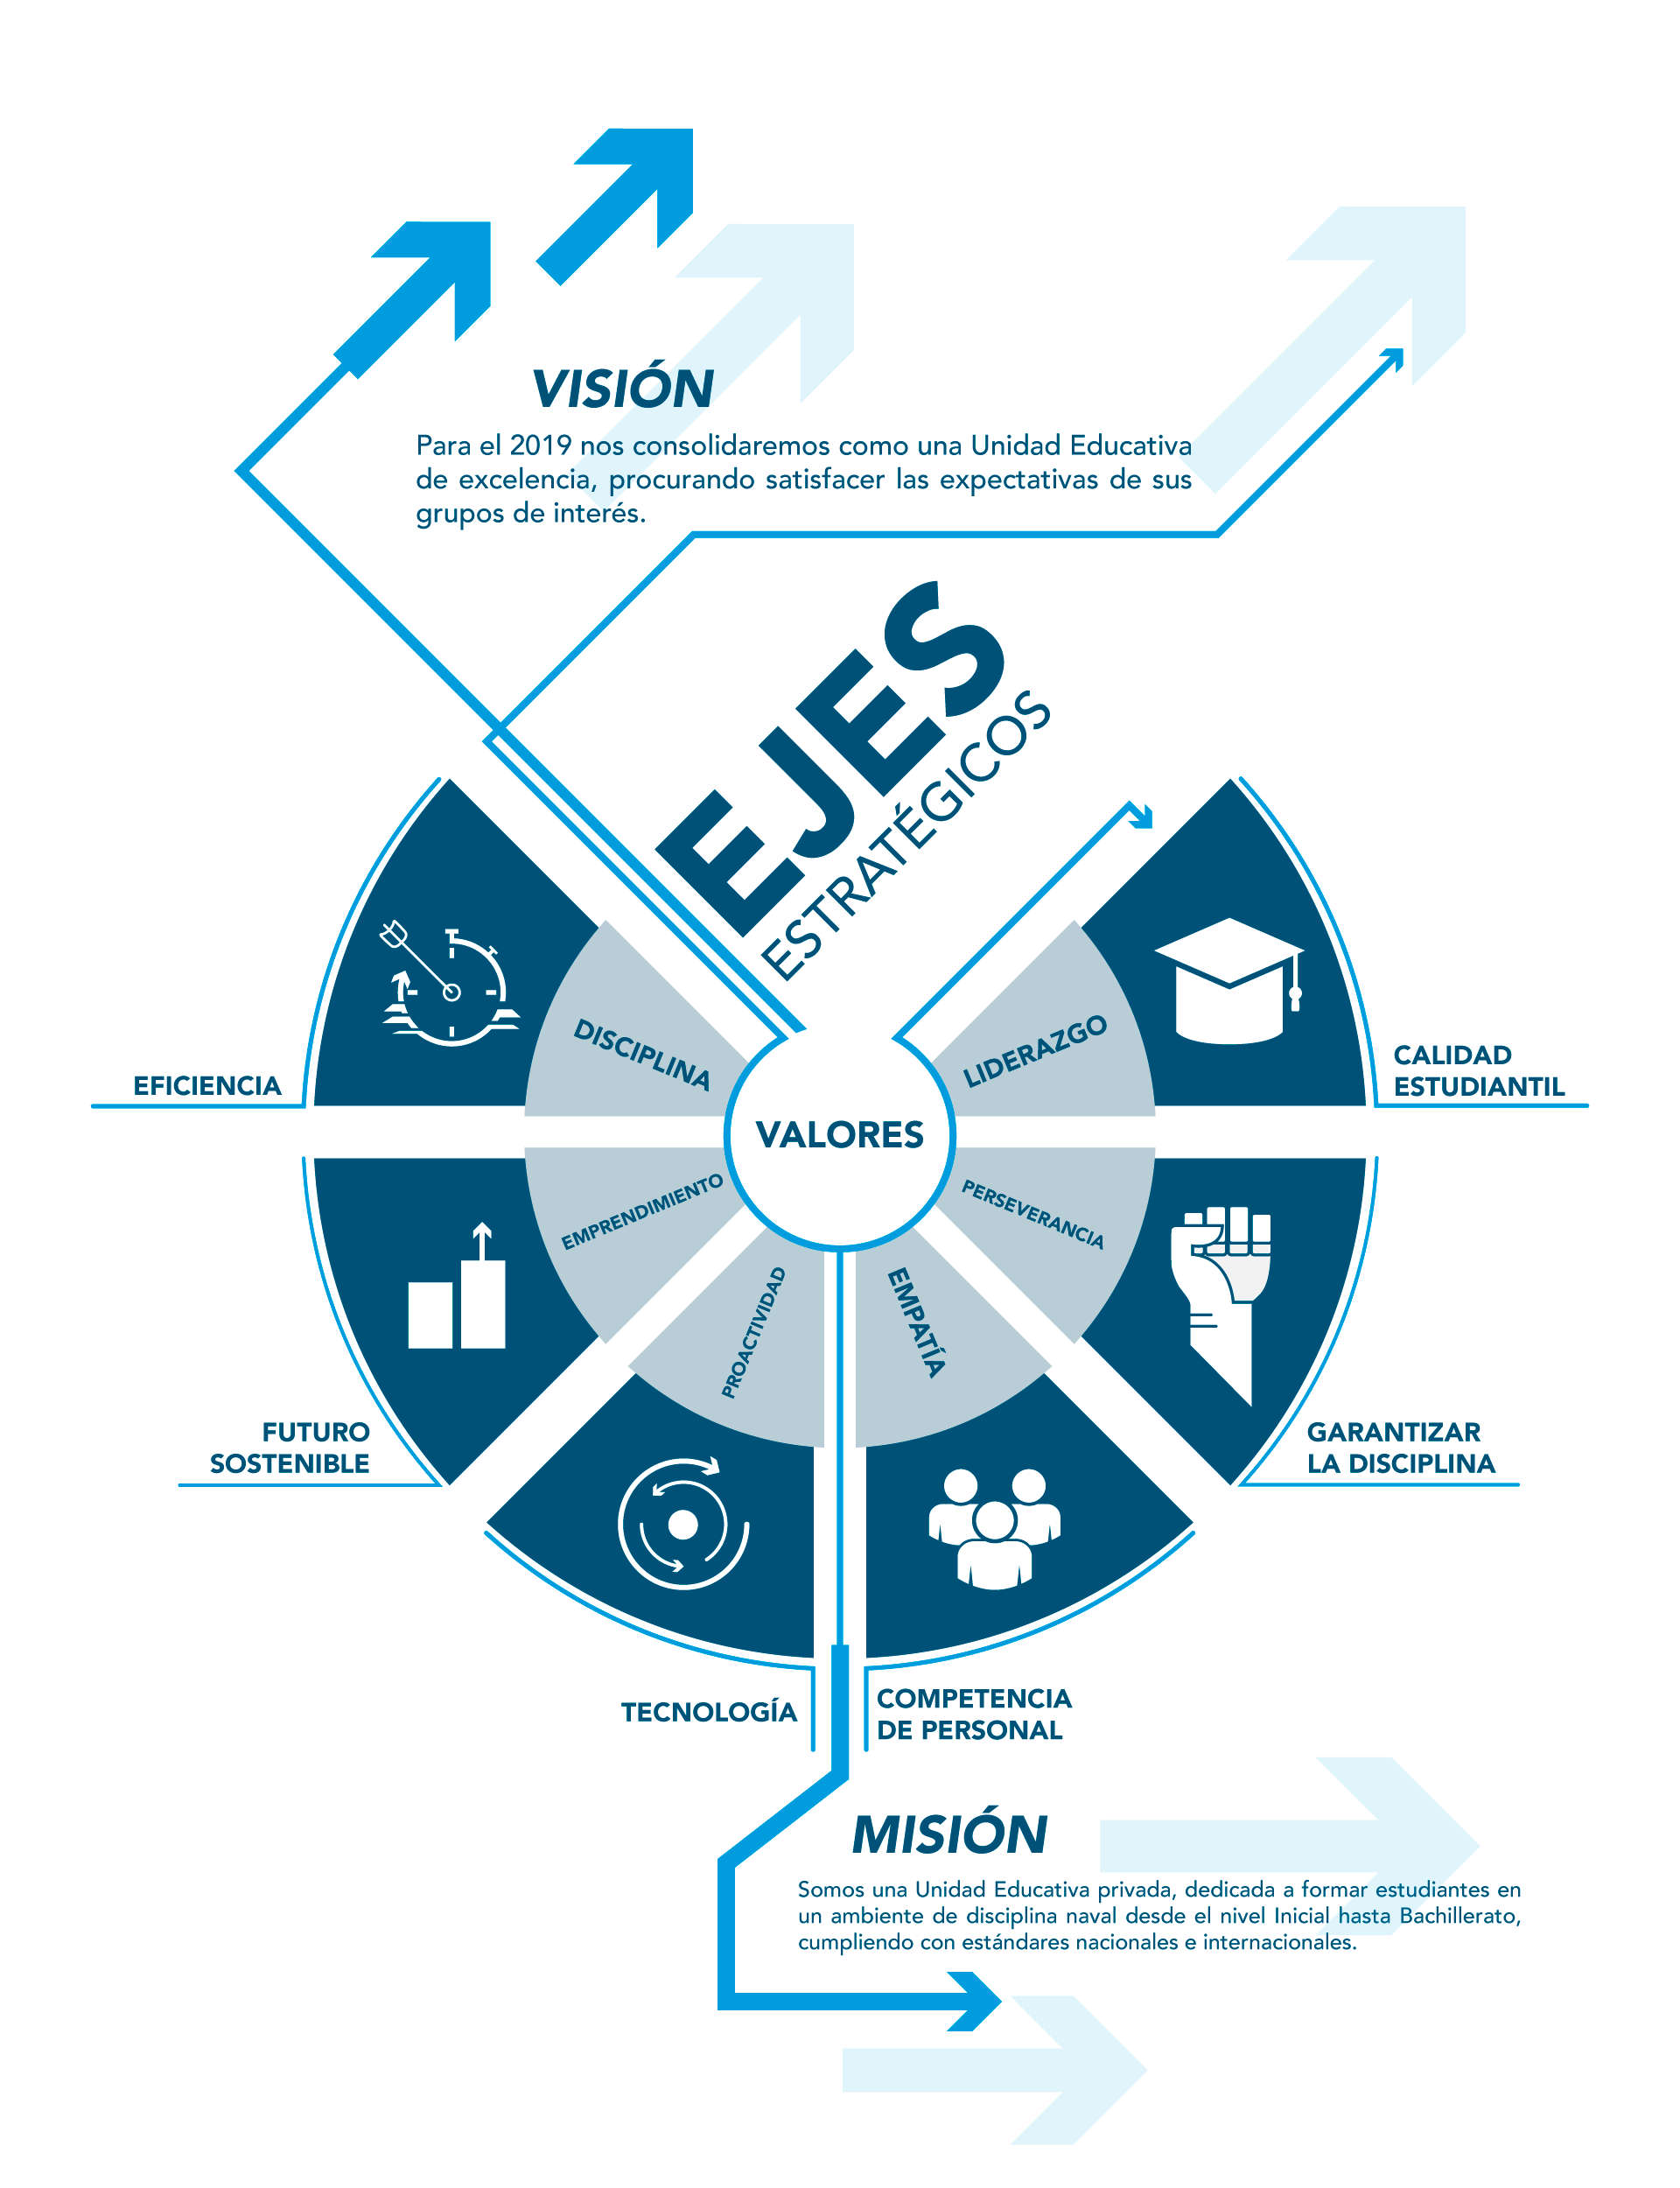 ejes_mision_vision_valores